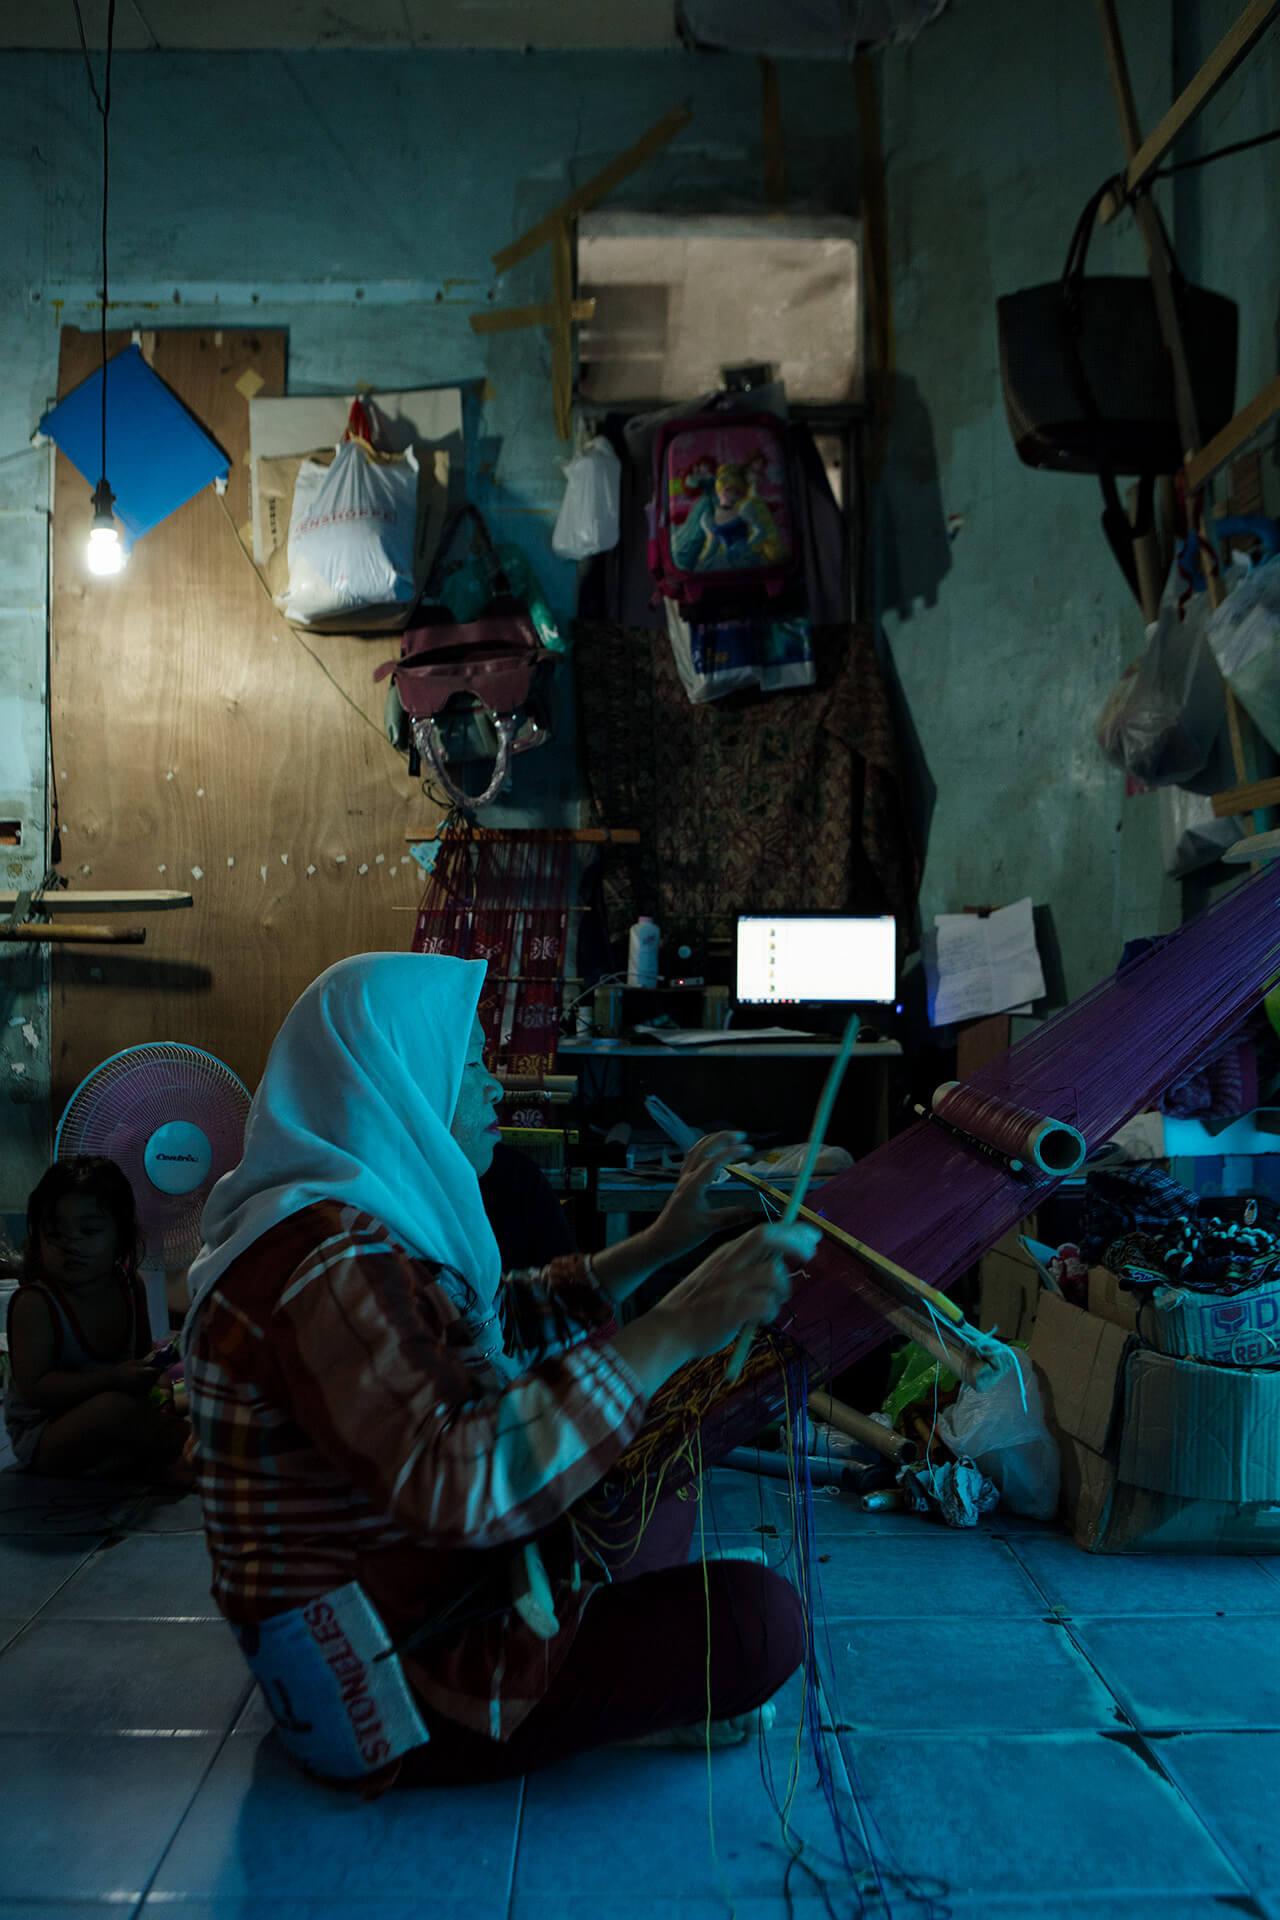 Maranao bakwit (refugee) weaving on the floor using a scavenged makeshift loom.